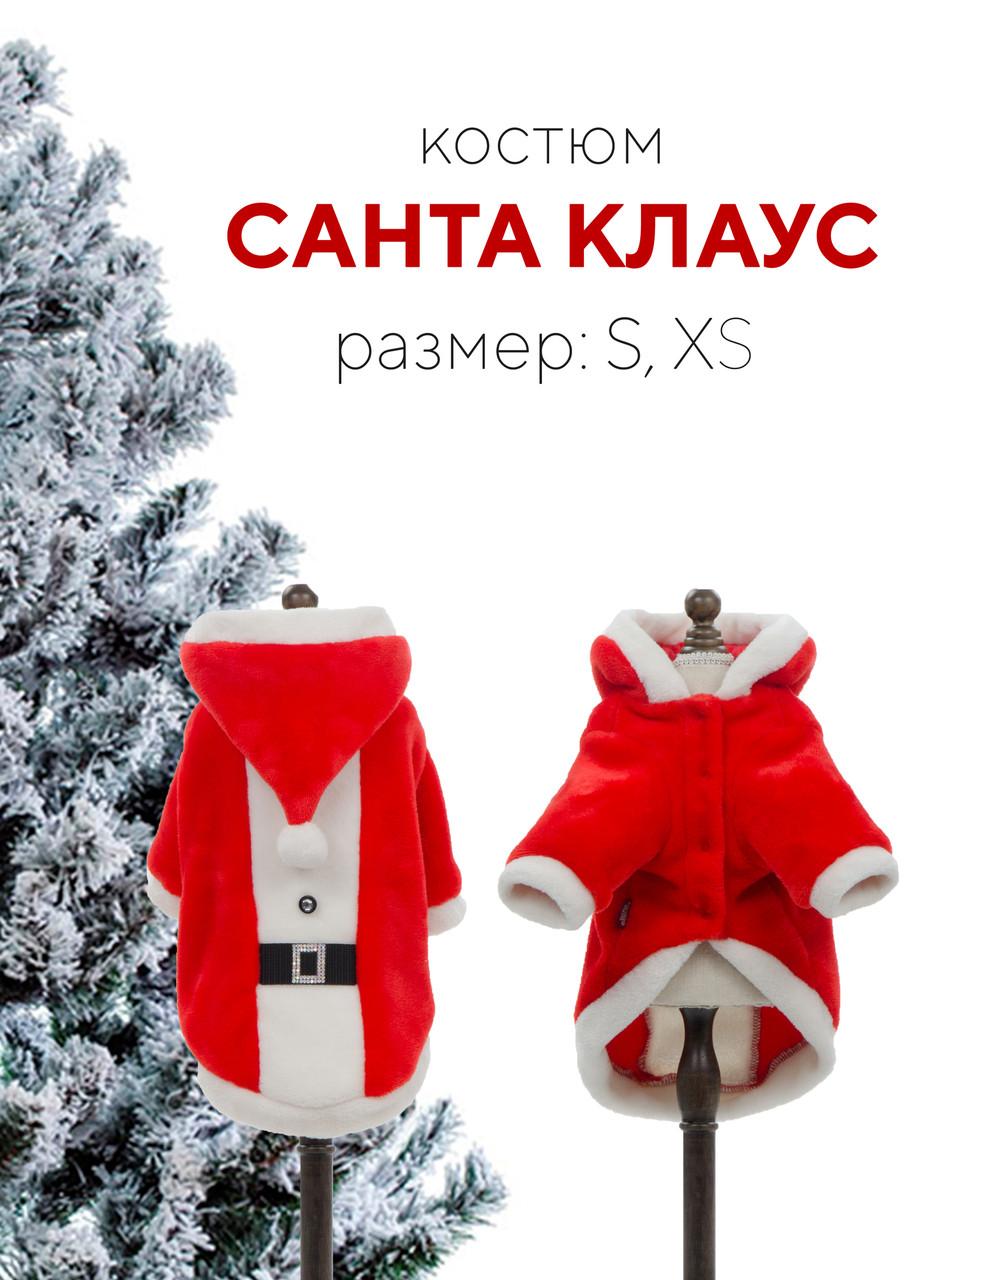 Костюм для собак Pet Fashion Санта-Клаус XS, Длина спины: 23-26 см, обхват груди: 28-32см